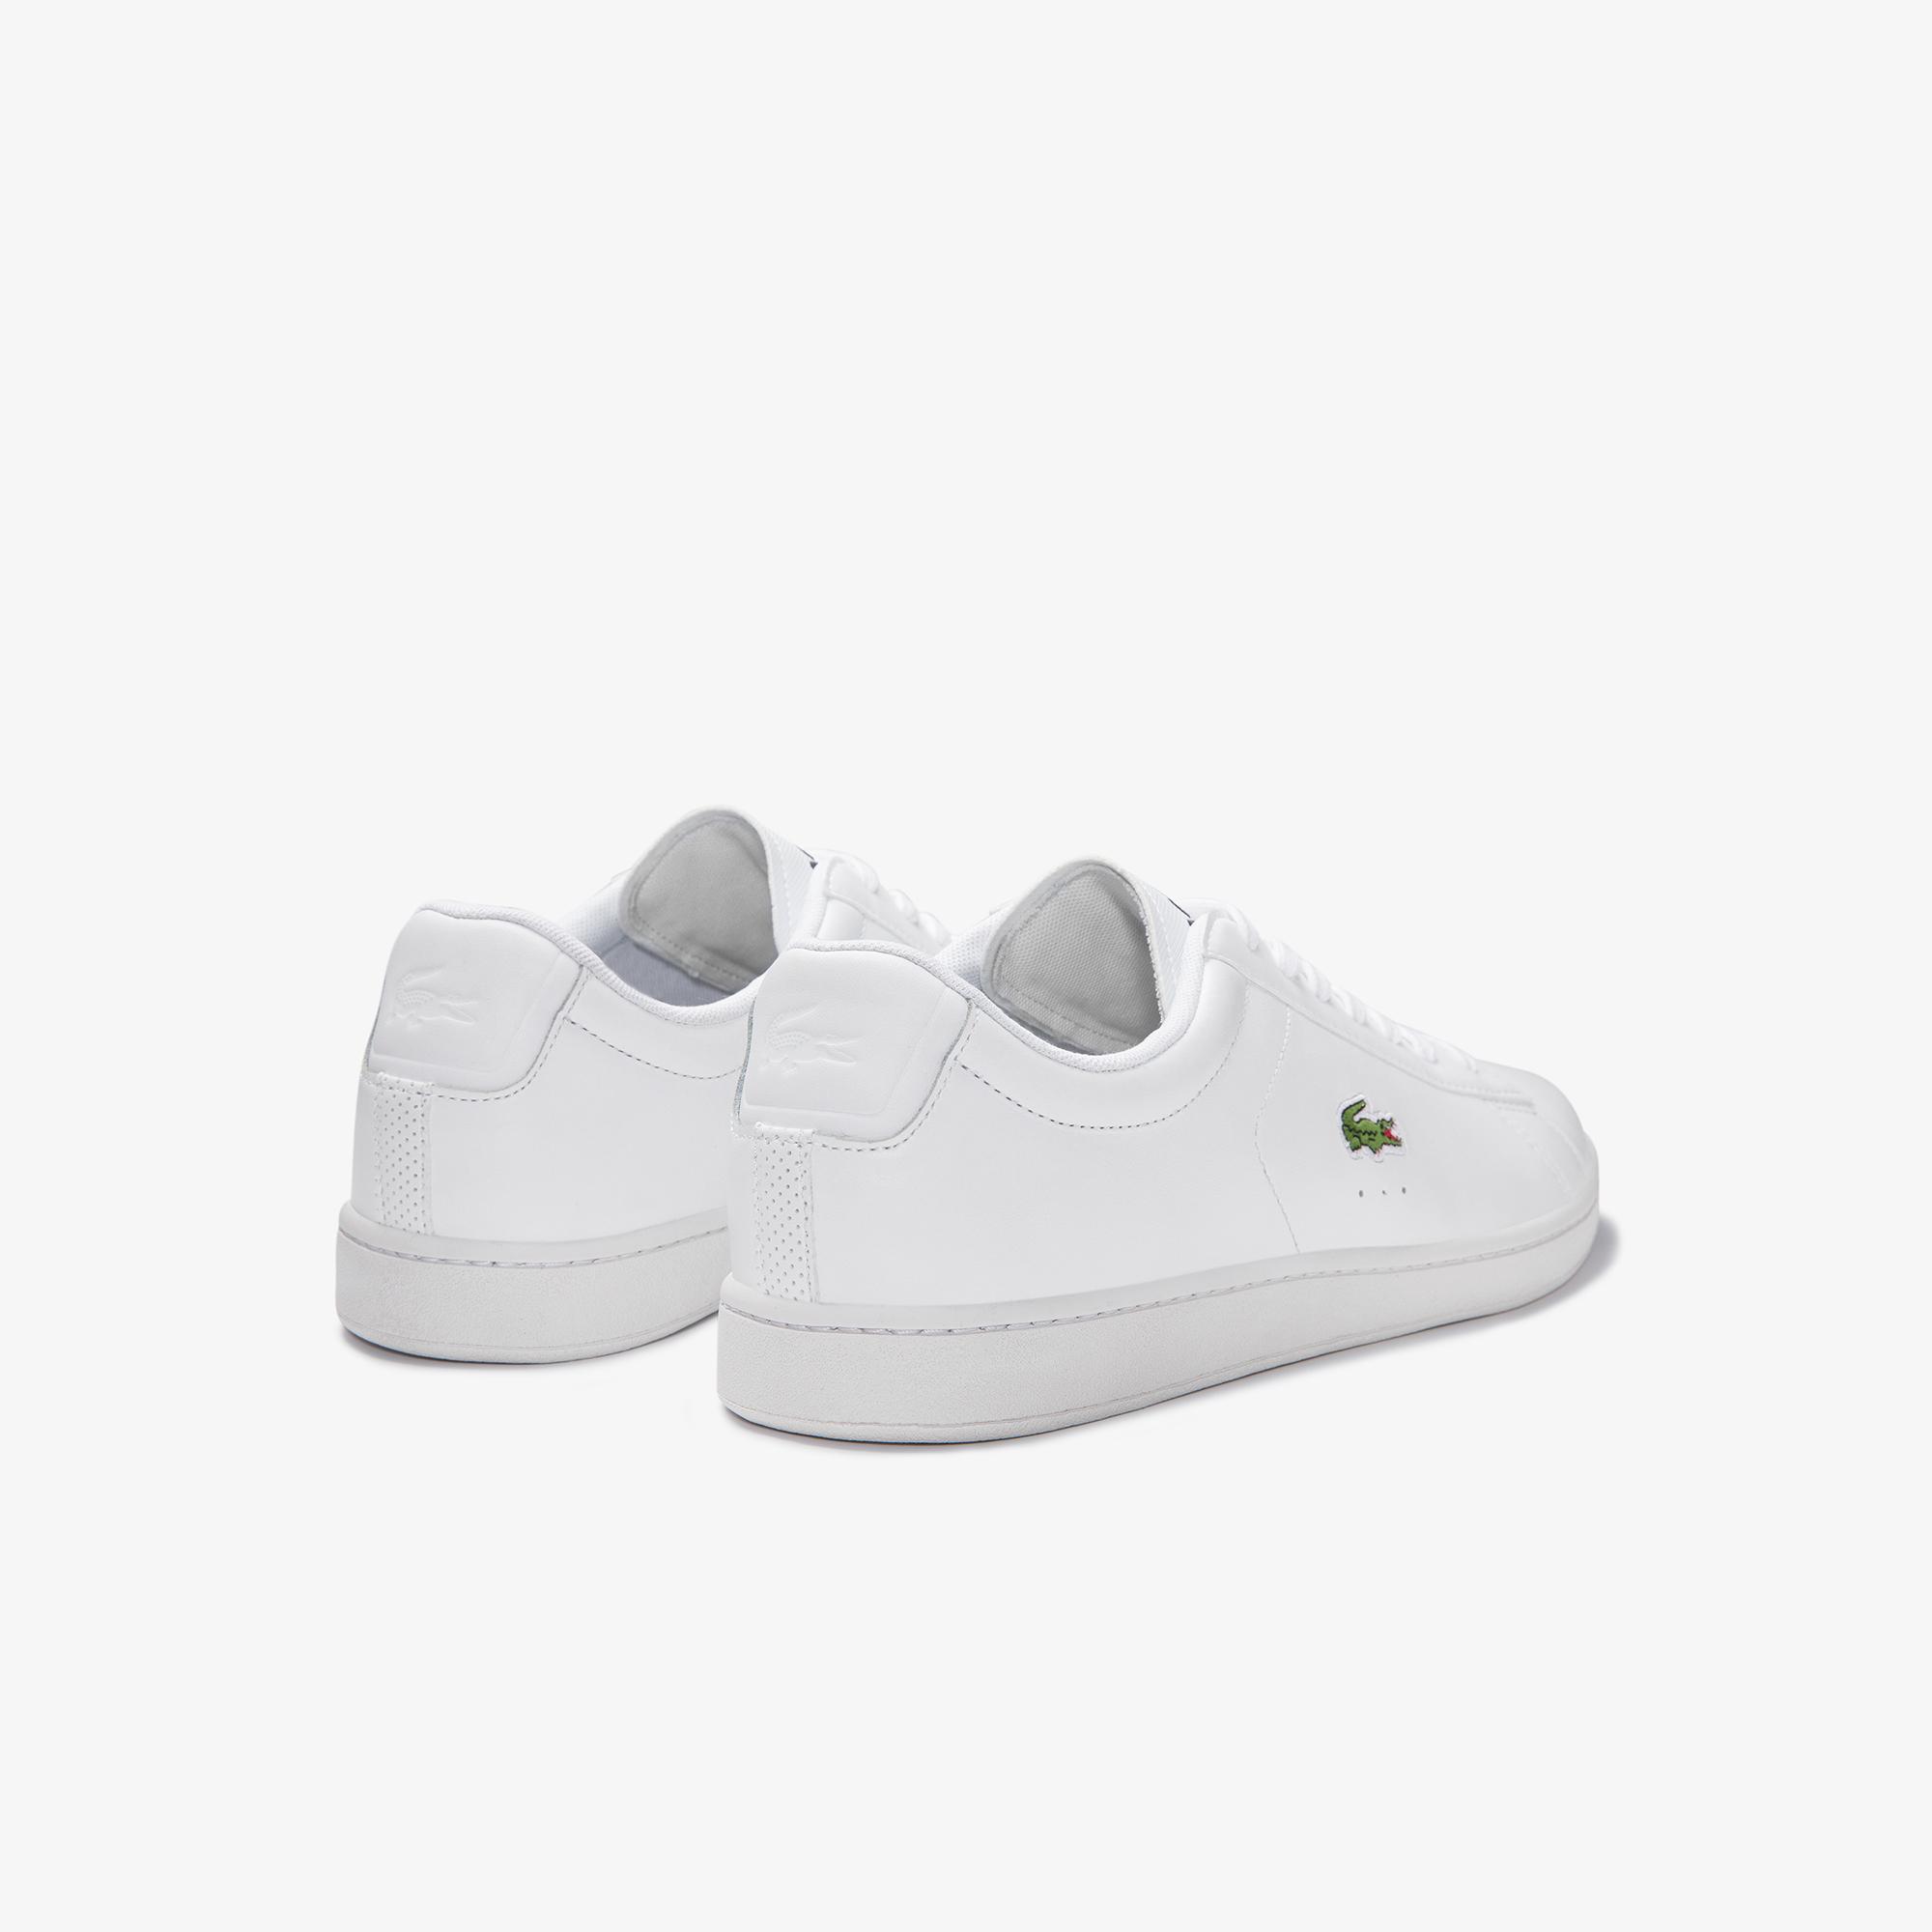 Lacoste Men's Carnaby Evo 0120 4 SMA Sneakers